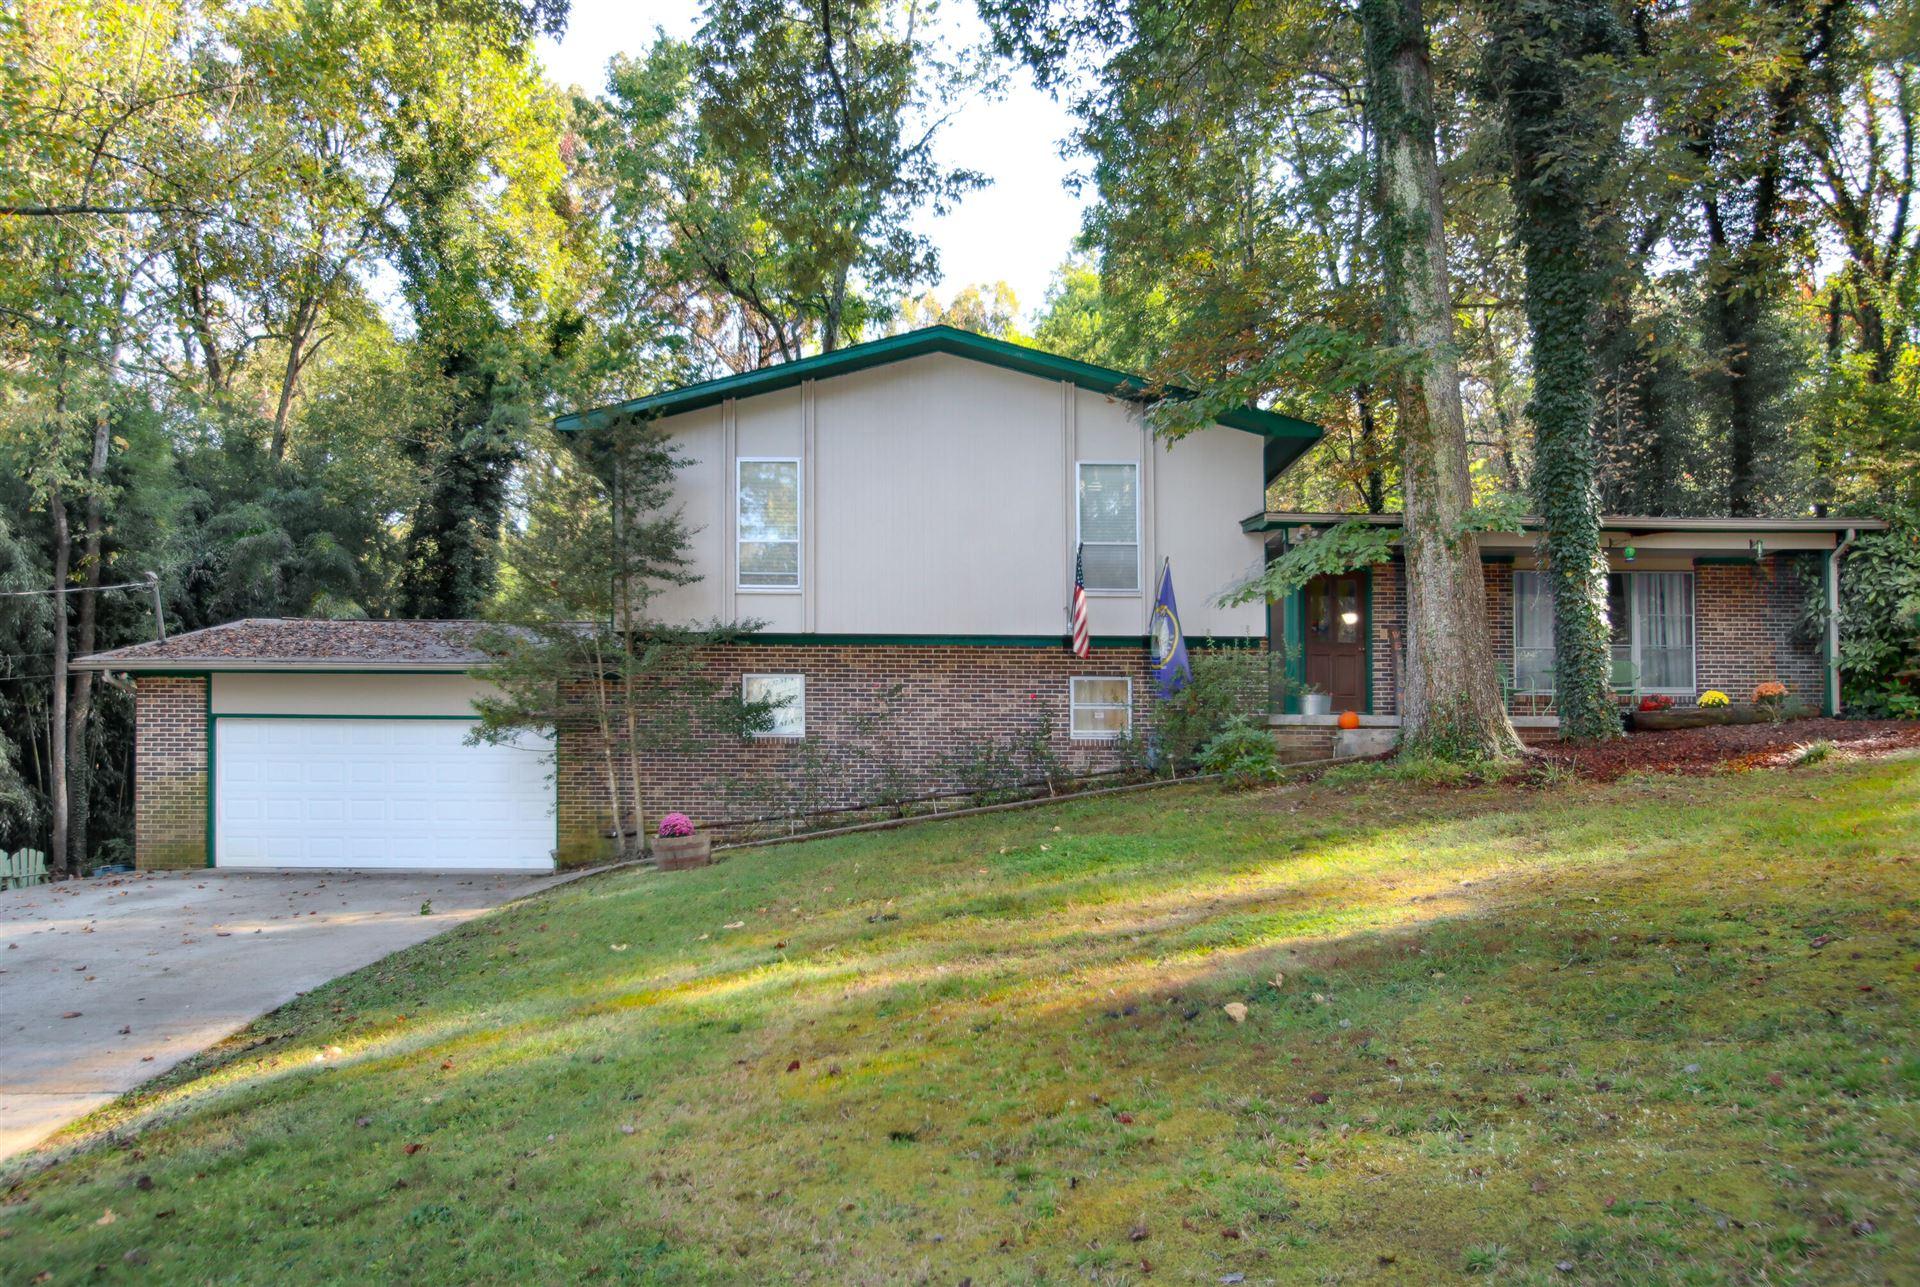 Photo of 123 Oklahoma Ave, Oak Ridge, TN 37830 (MLS # 1170246)